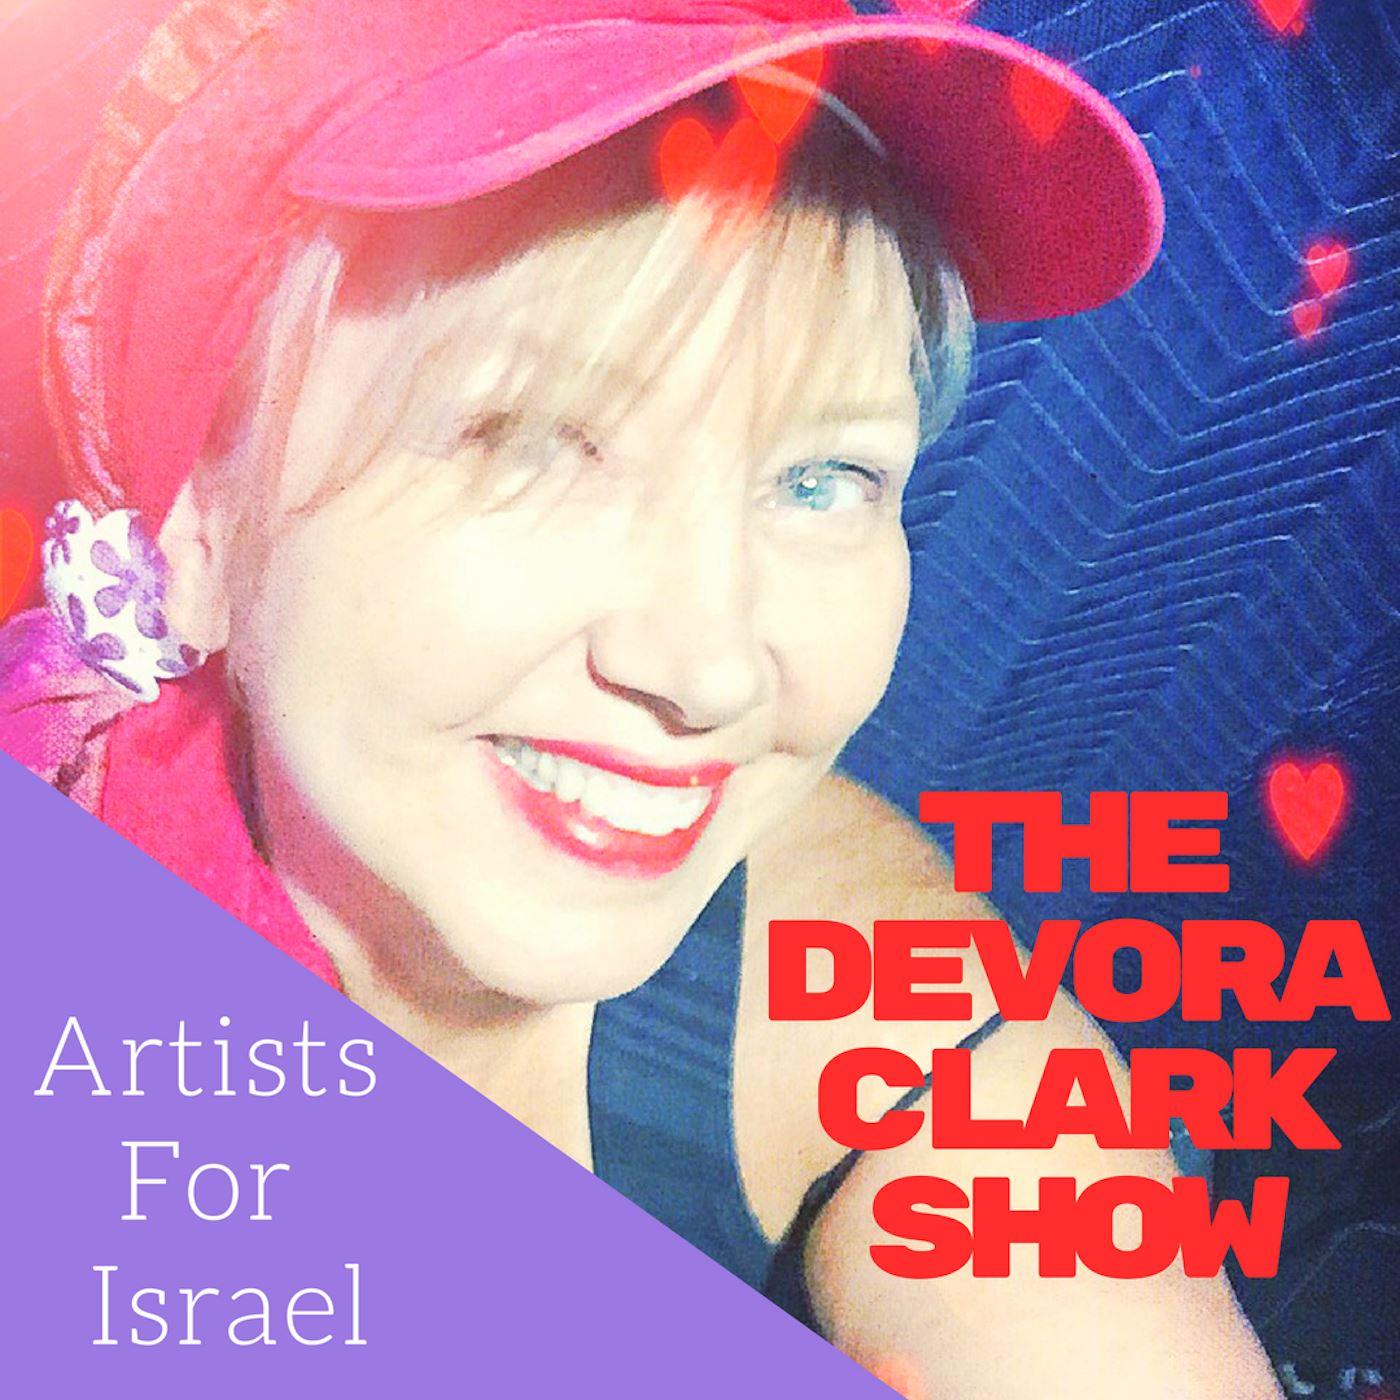 The DeVora Clark Show